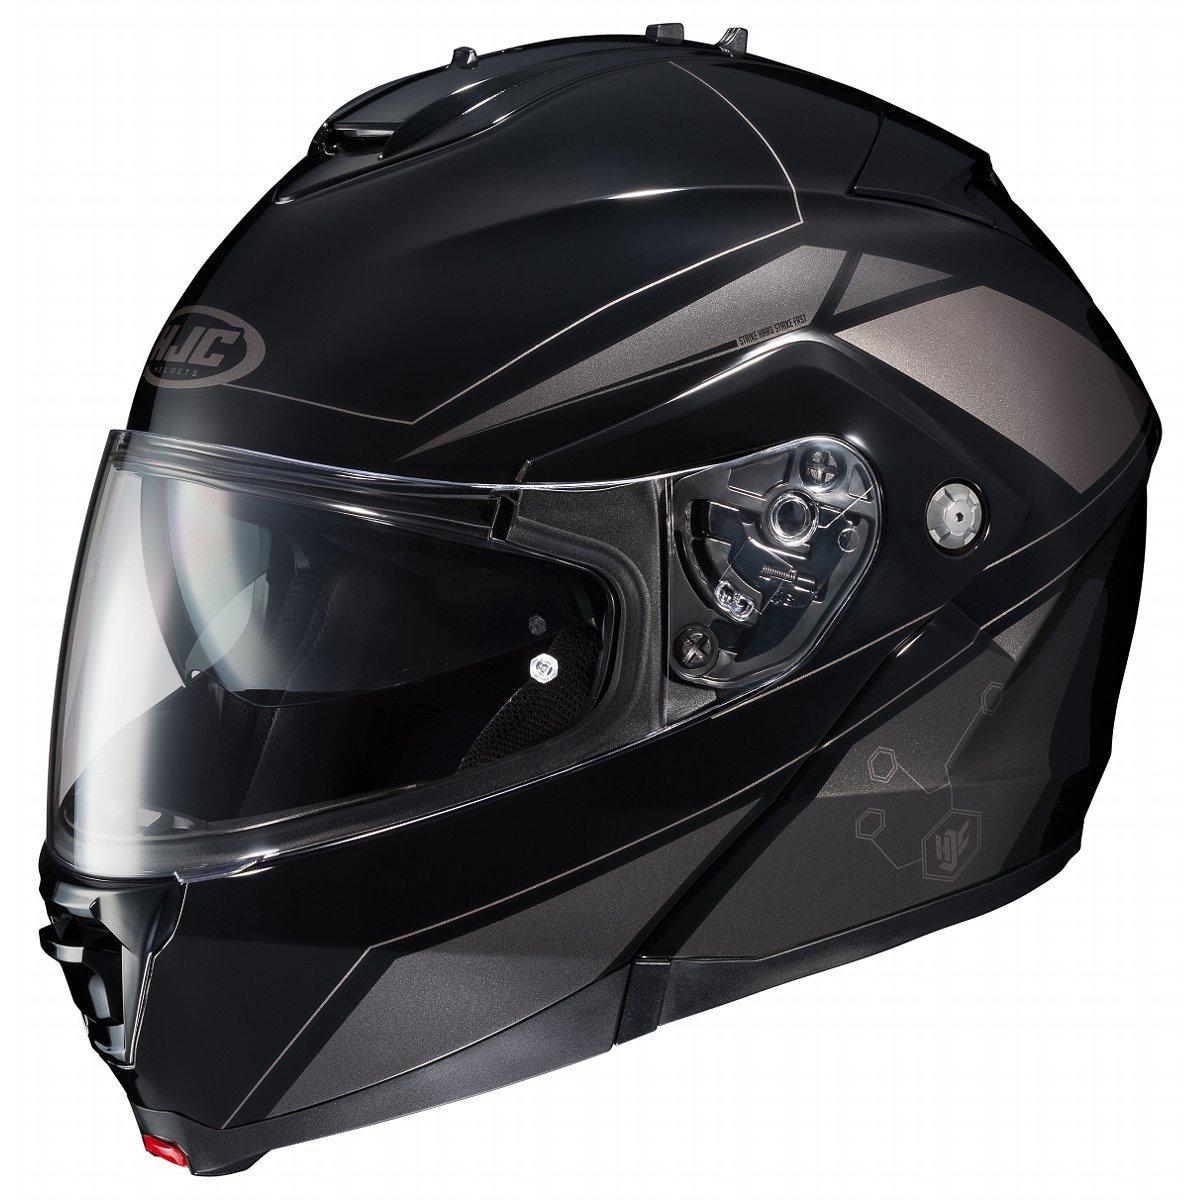 HJC IS-MAX2SN Elemental Modular Snow Helmet Frameless Dual Lens Shield (MC-5 Silver, Small)